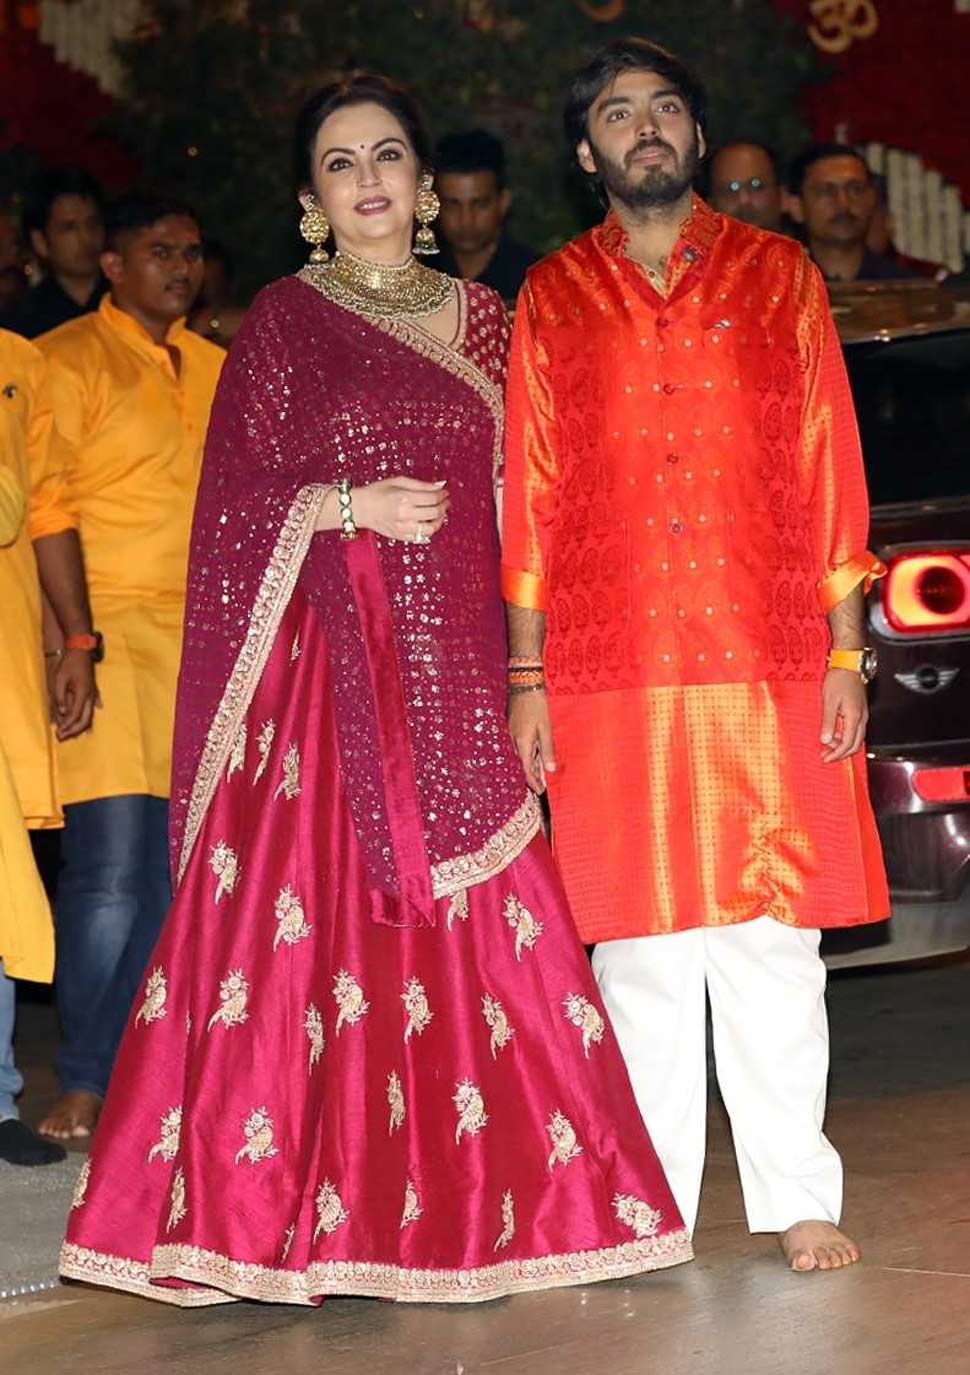 ganesh chaturthi celebration 2018